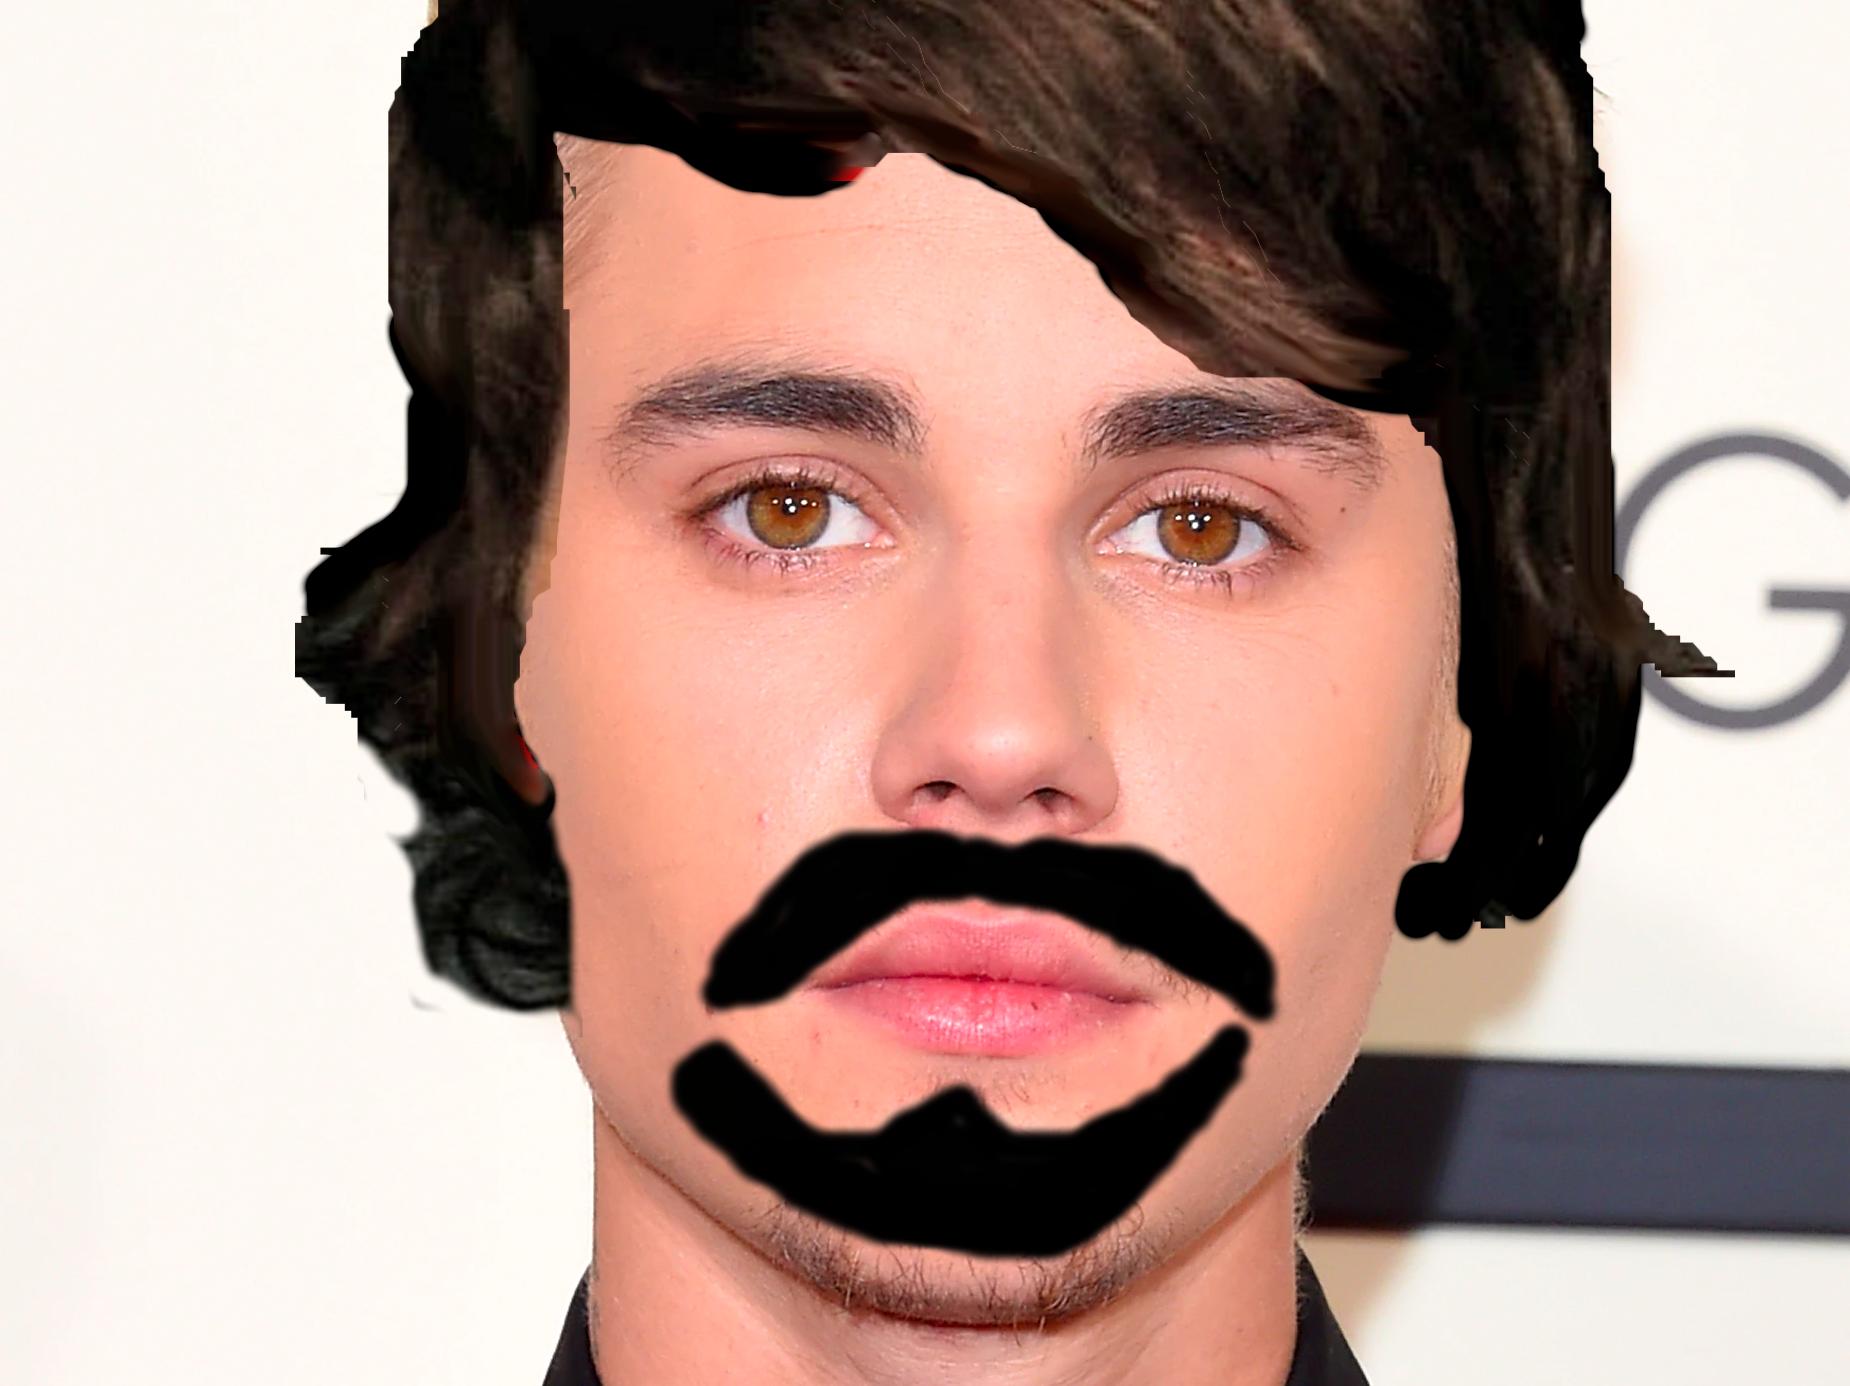 Justin Bieber's Dumb Mustache-Wig Disguise: Not That Dumb